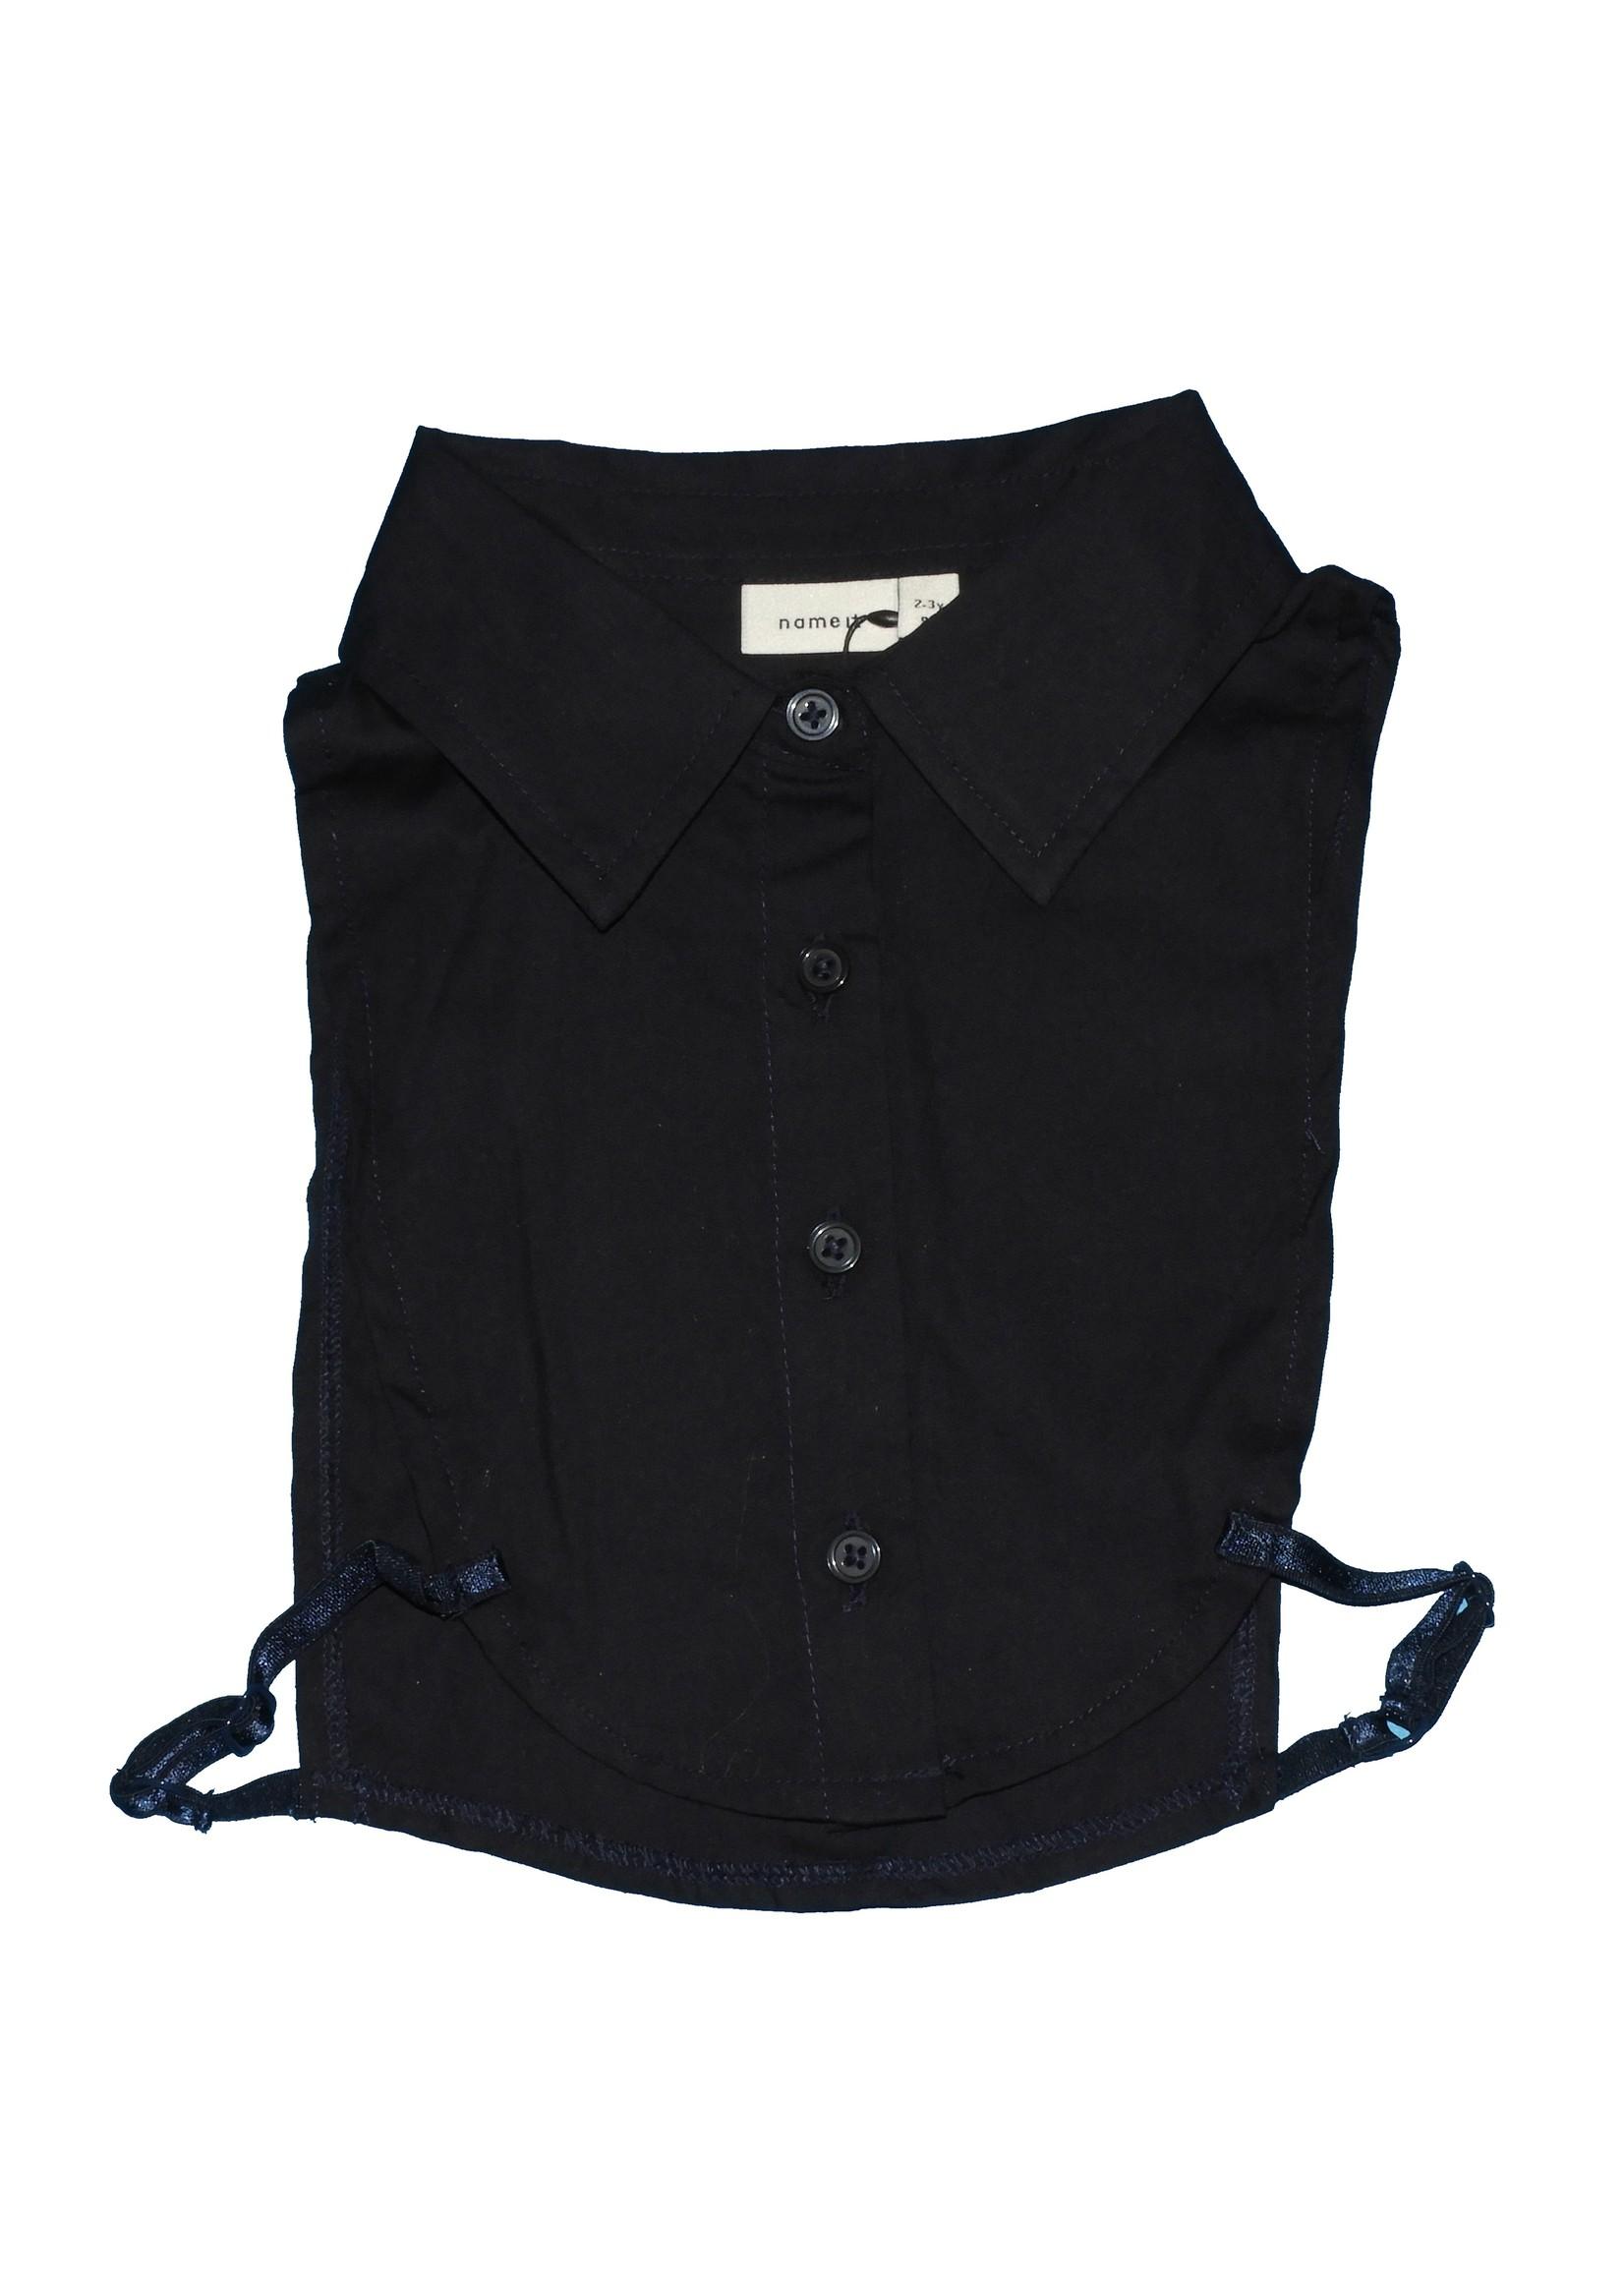 Name it blouse kraag maat 80 t/m 92